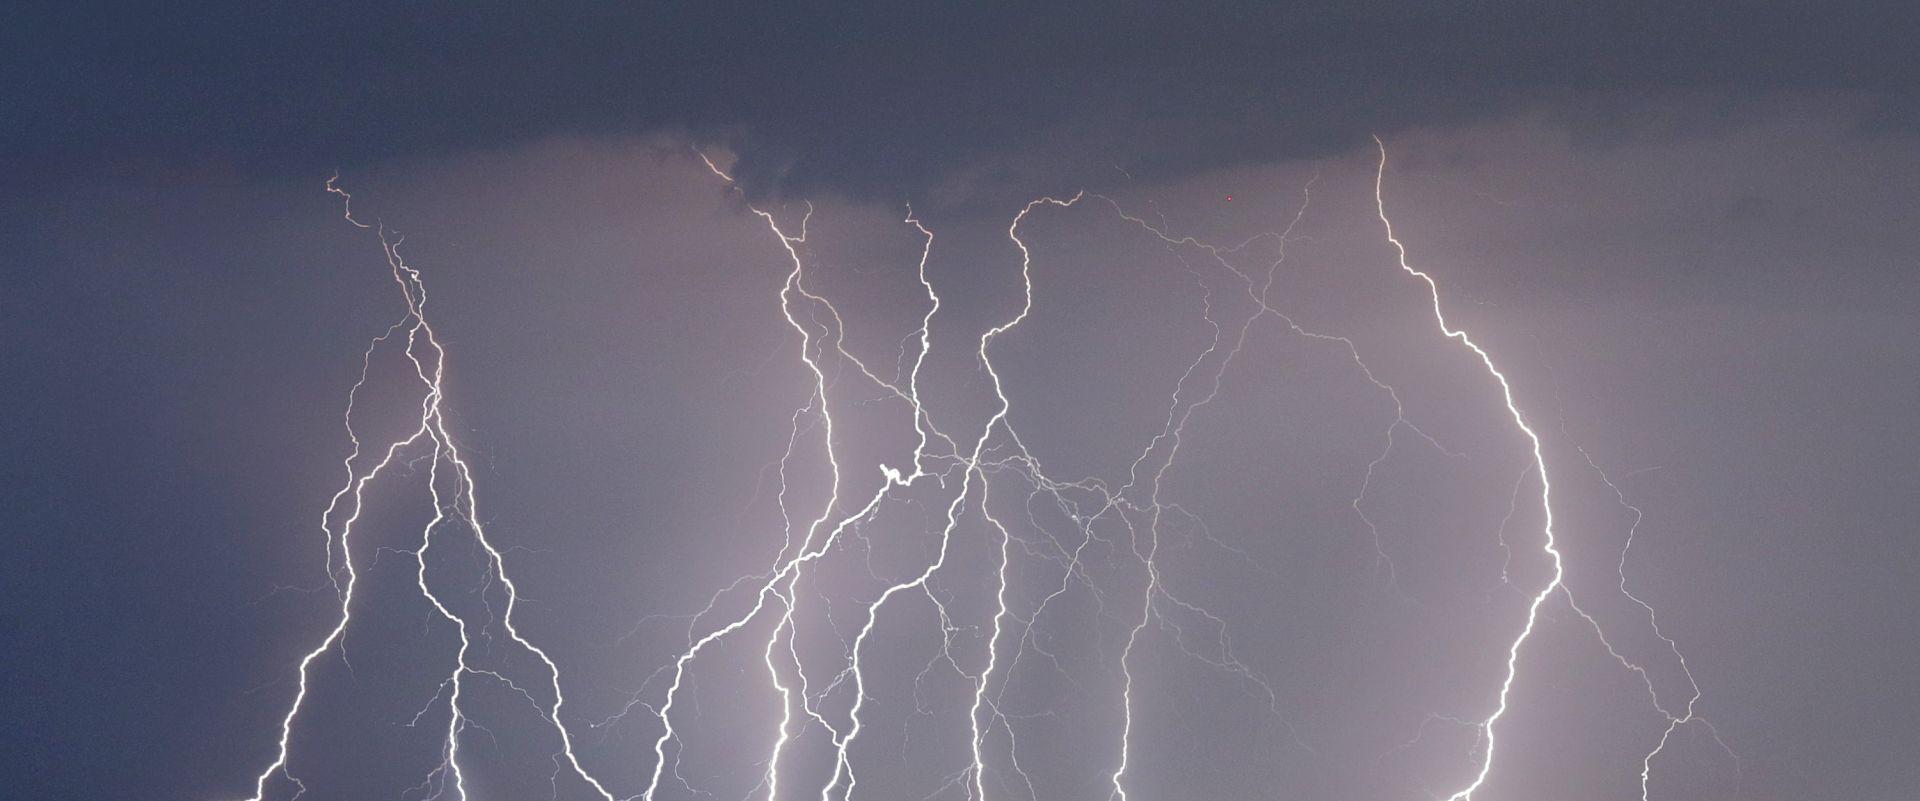 NAKON SUNČANOG DANA: Navečer stižu jake grmljavinske oluje